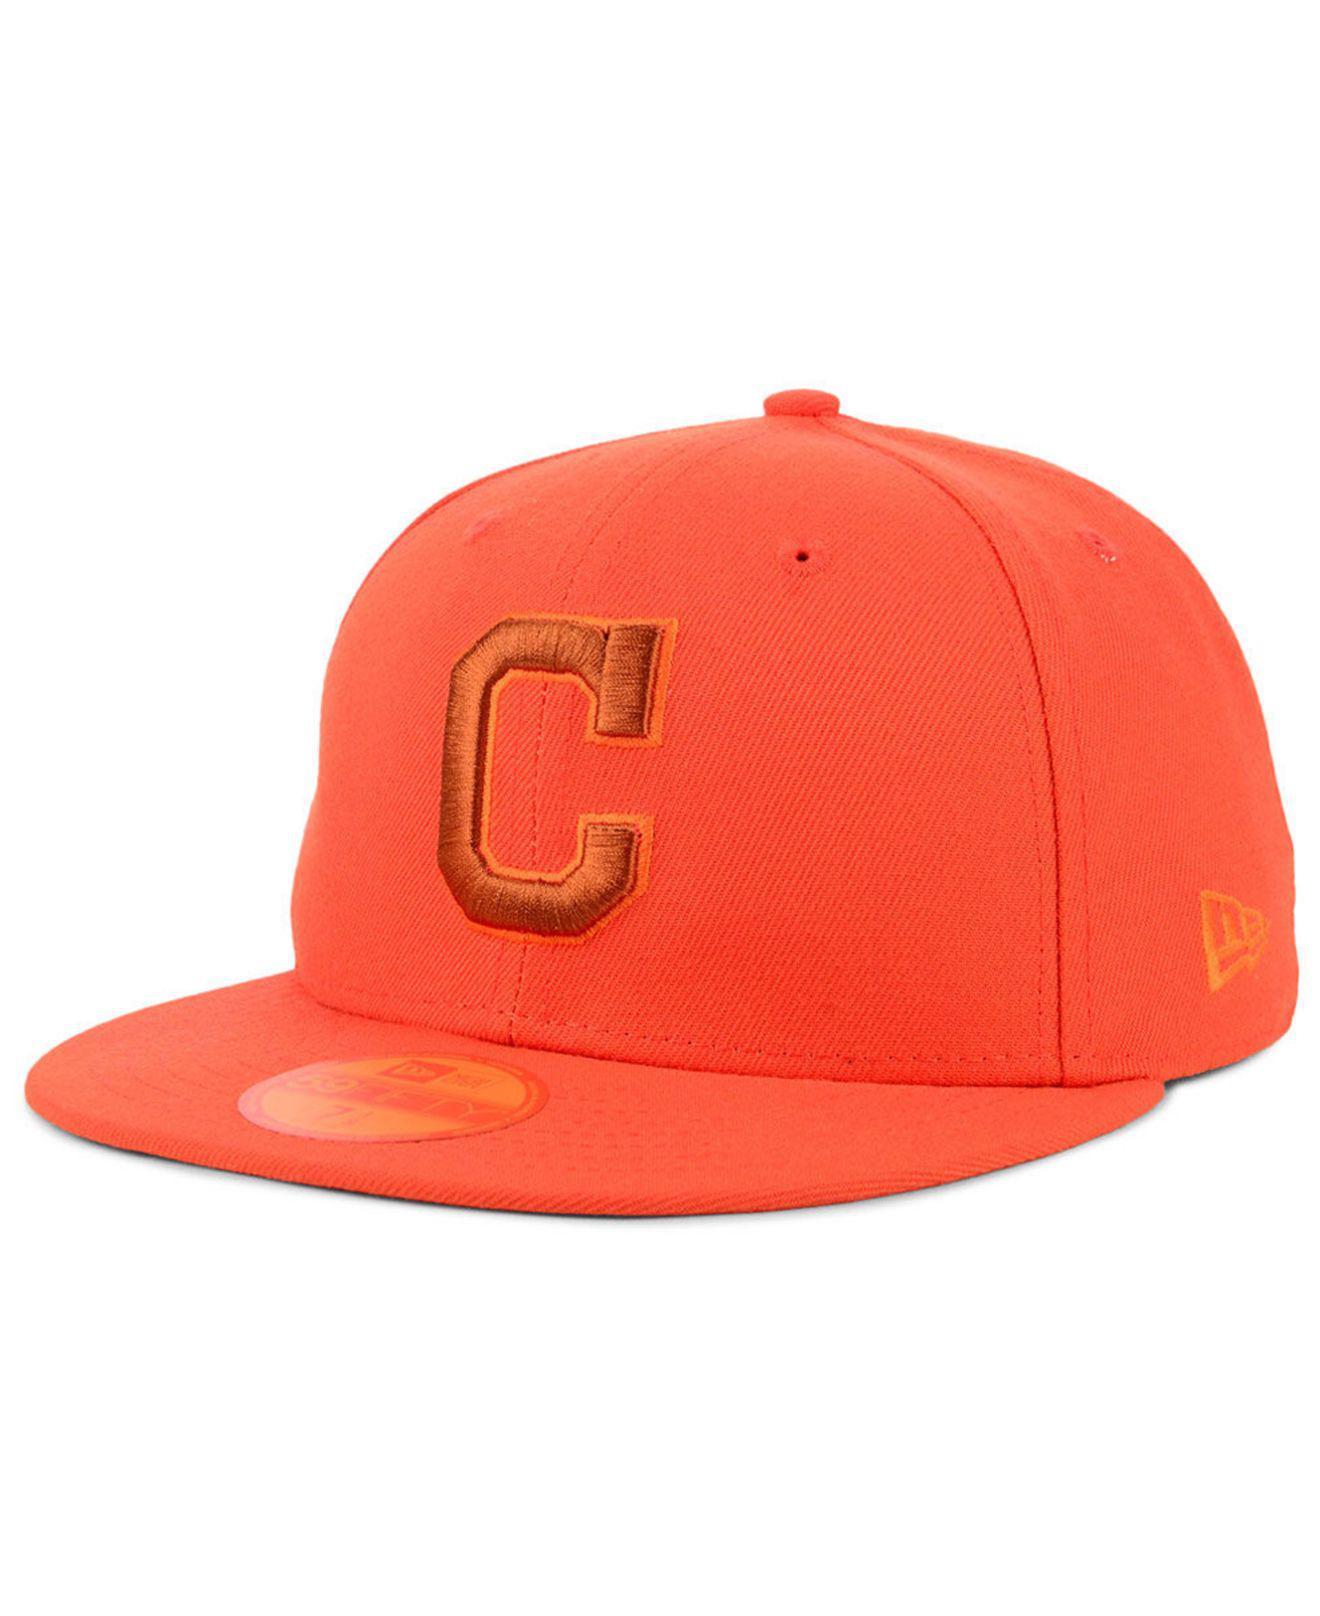 huge selection of fa795 5aab4 KTZ. Men s Orange Cleveland Indians Prism Color Pack 59fifty Fitted Cap